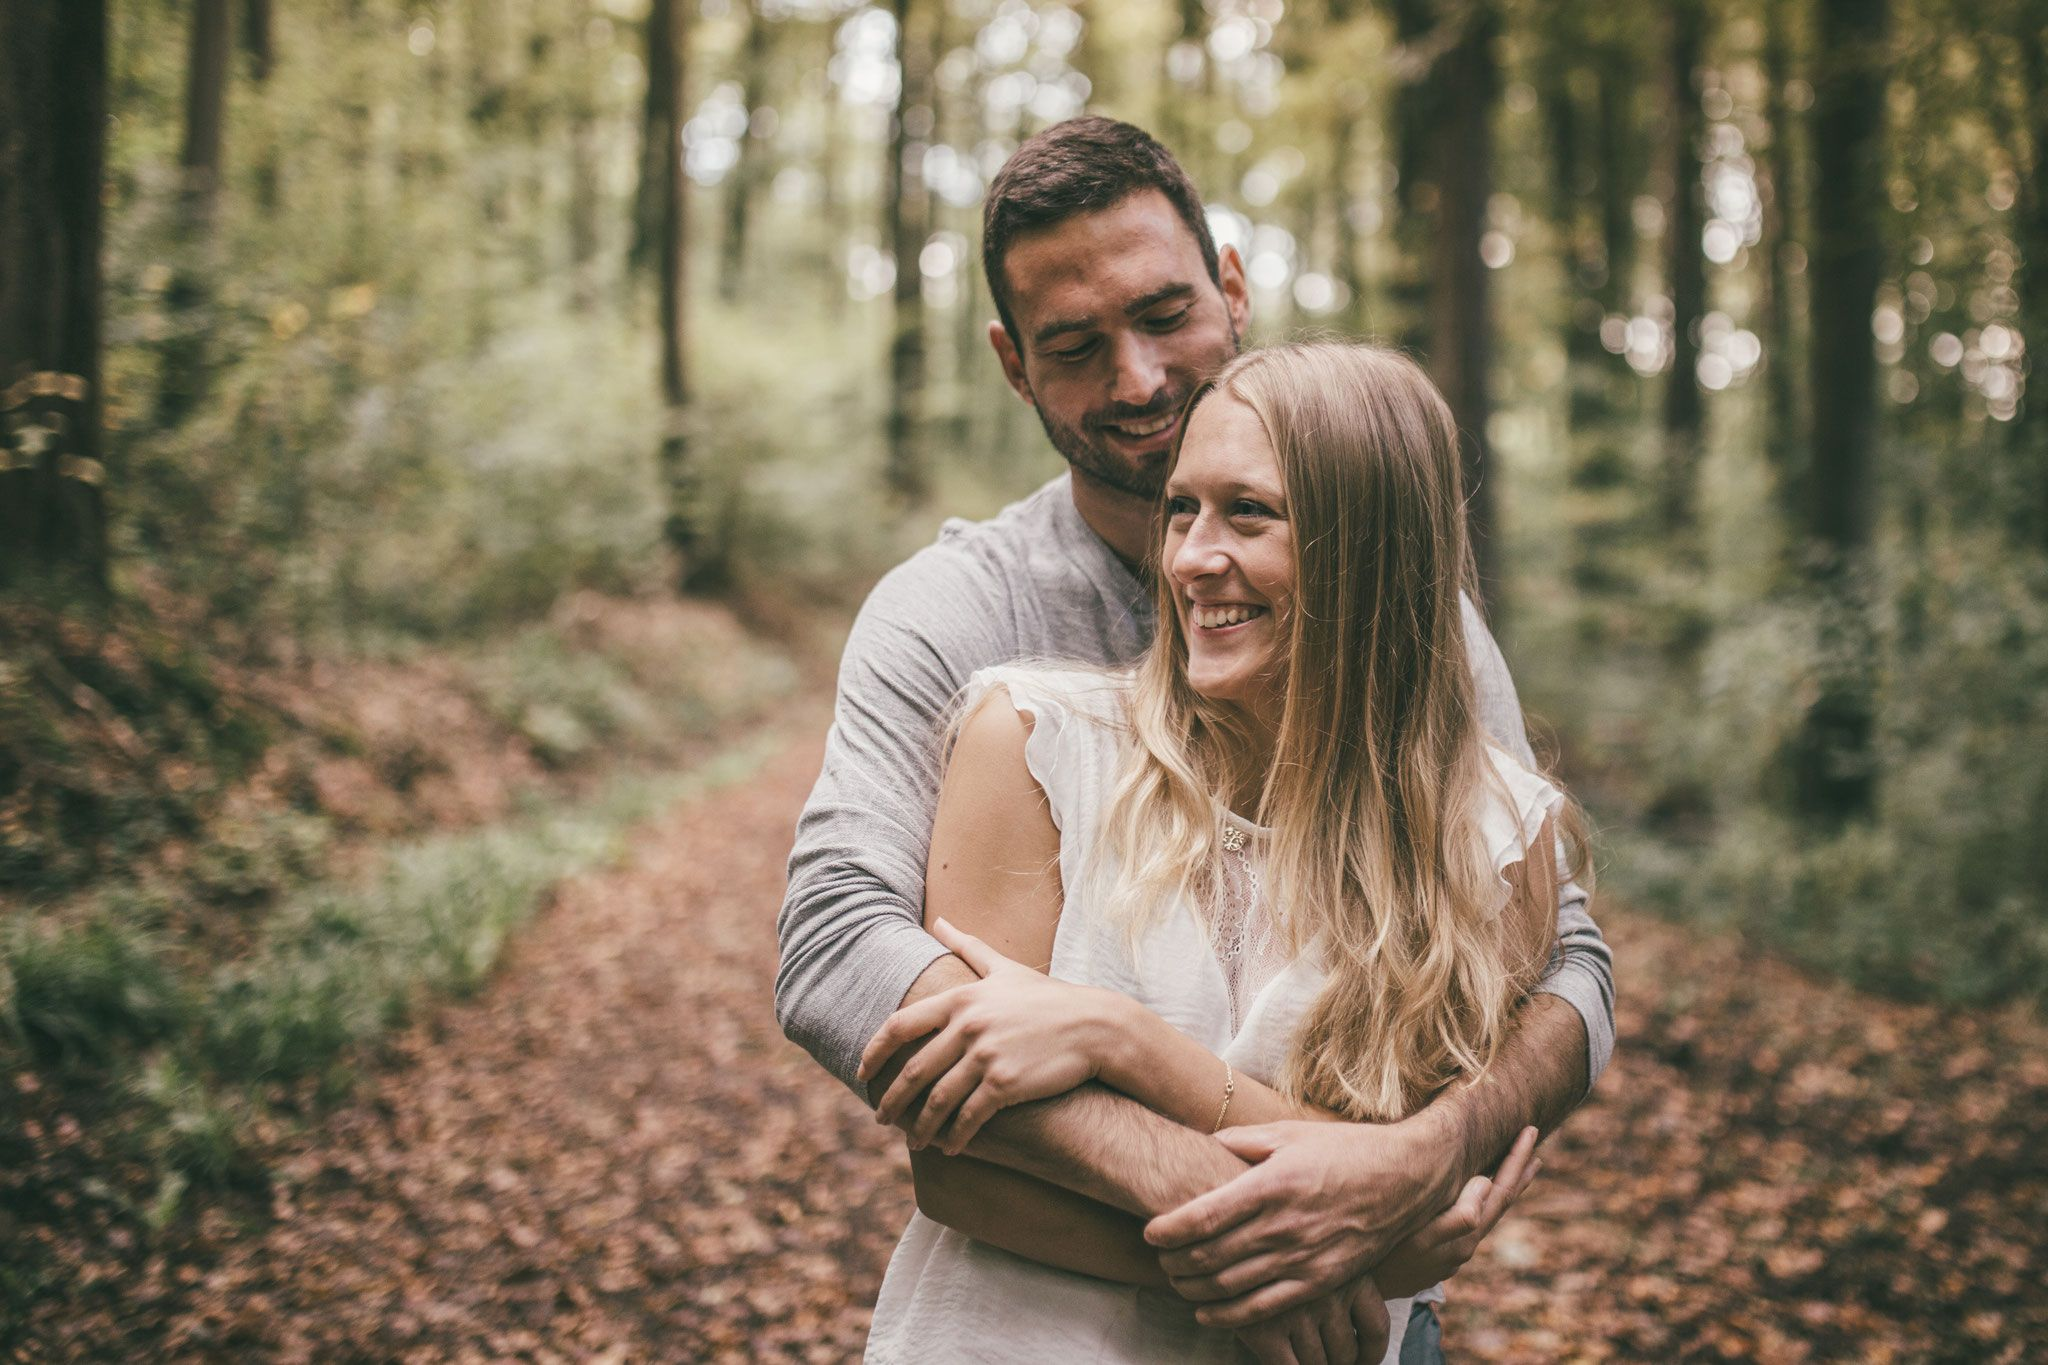 Pärchenfotos, Paar, Couple Photoshoot, Fotoshooting, Herbstfotos, Liebe, Natur, draußen